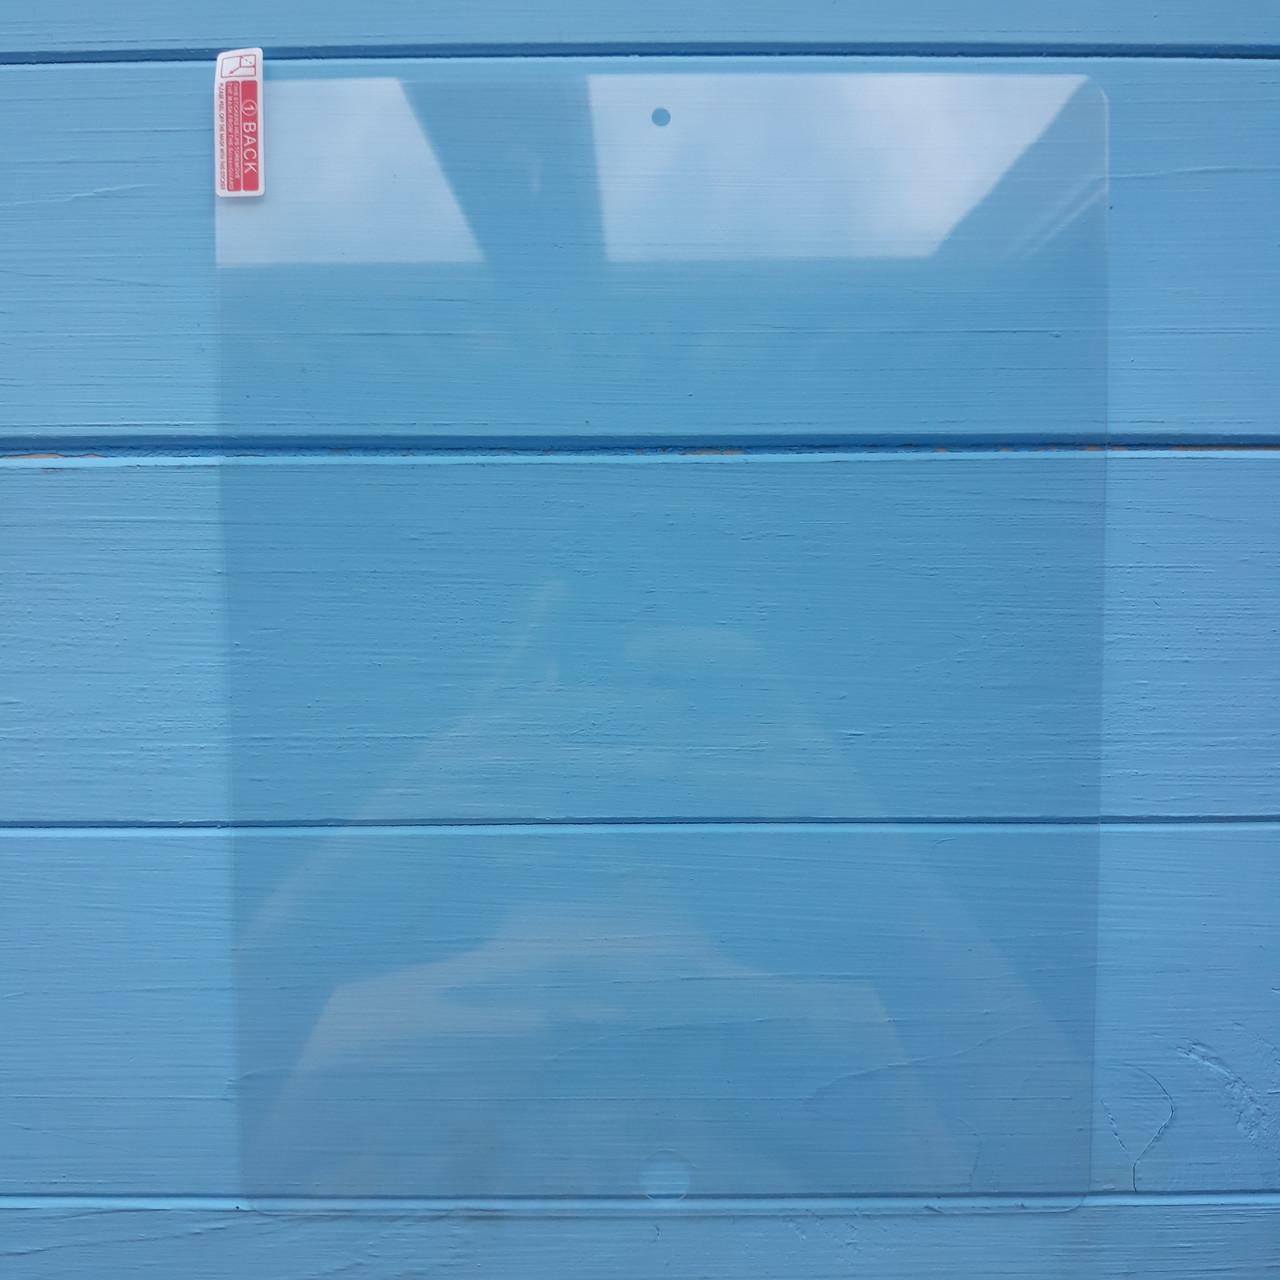 Защитное стекло планшета Apple iPad 2, 3, 4 с закругленными краями